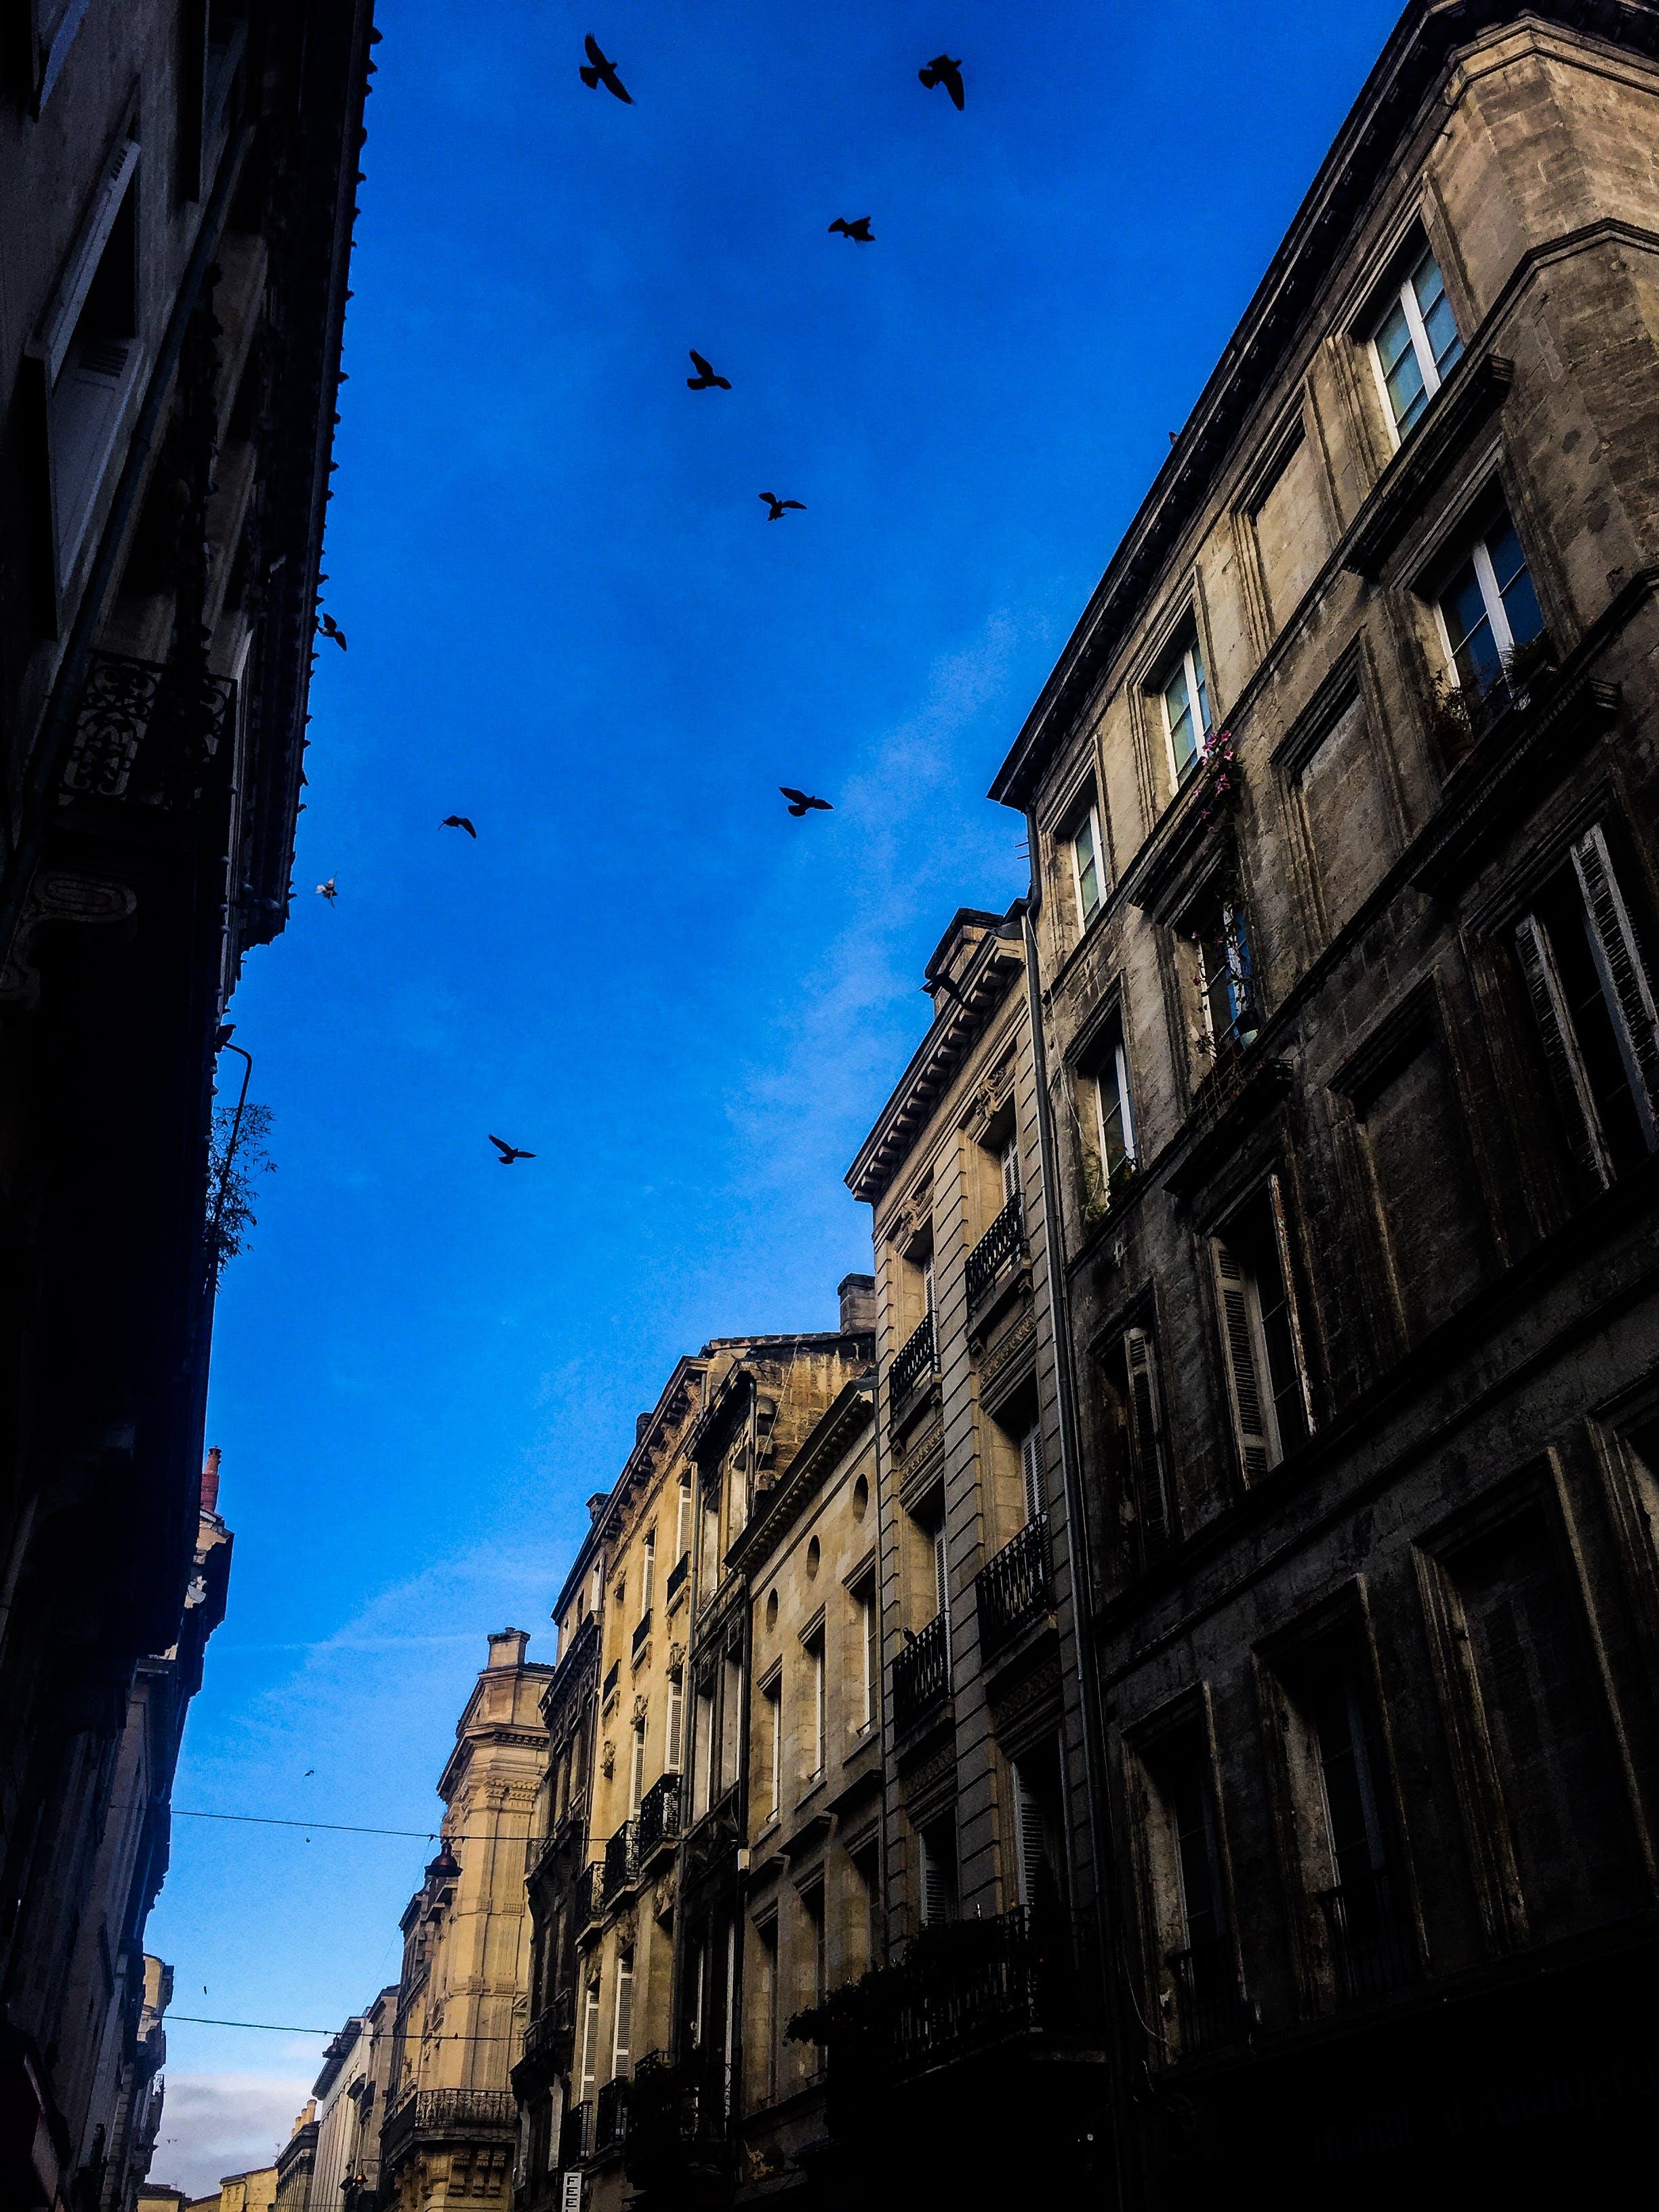 Free stock photo of apartment building, bird, blue sky, city